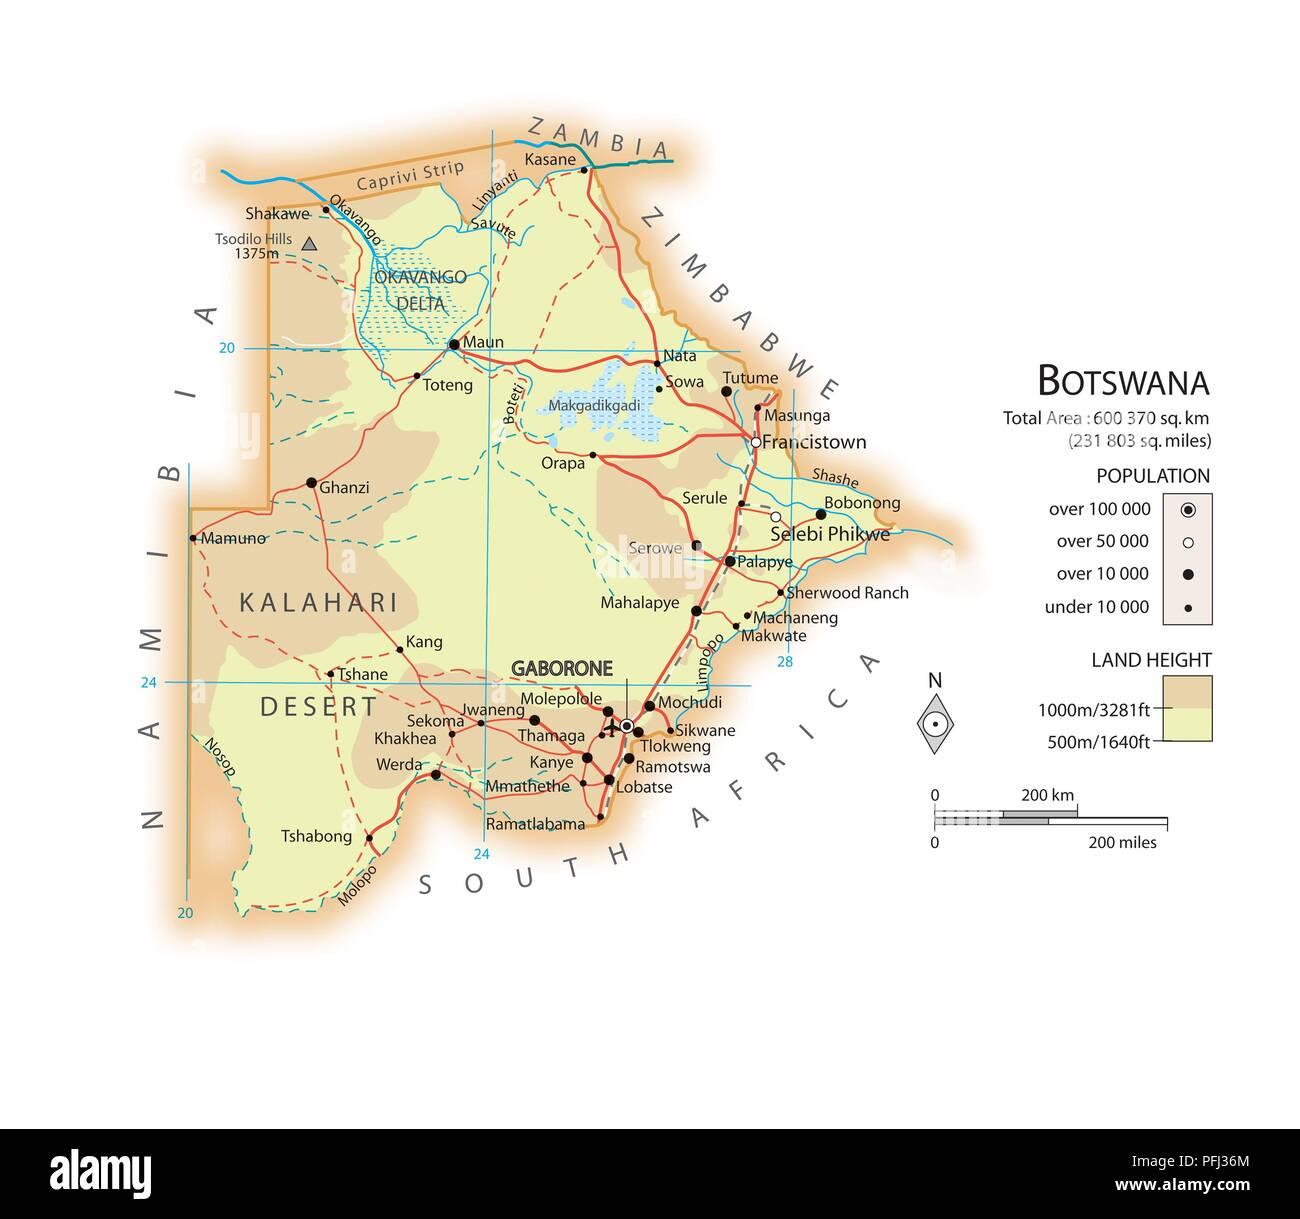 Map of Botswana Stock Photo: 216141932 - Alamy